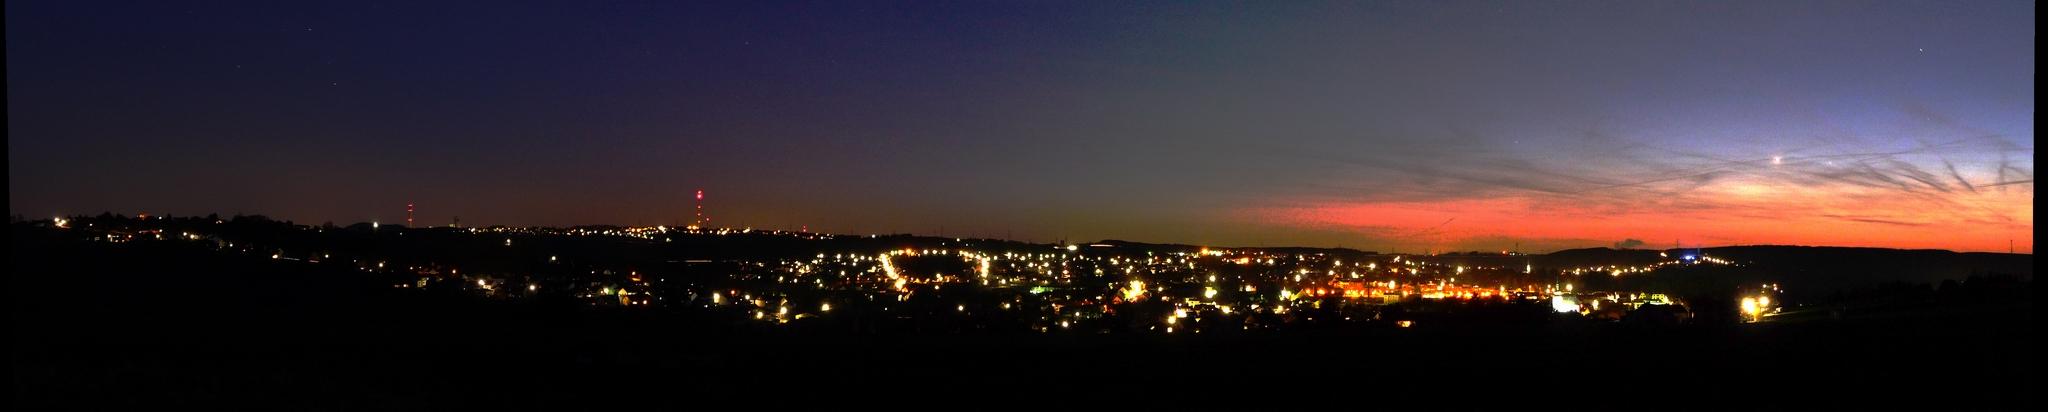 Panorama_bei_Nacht